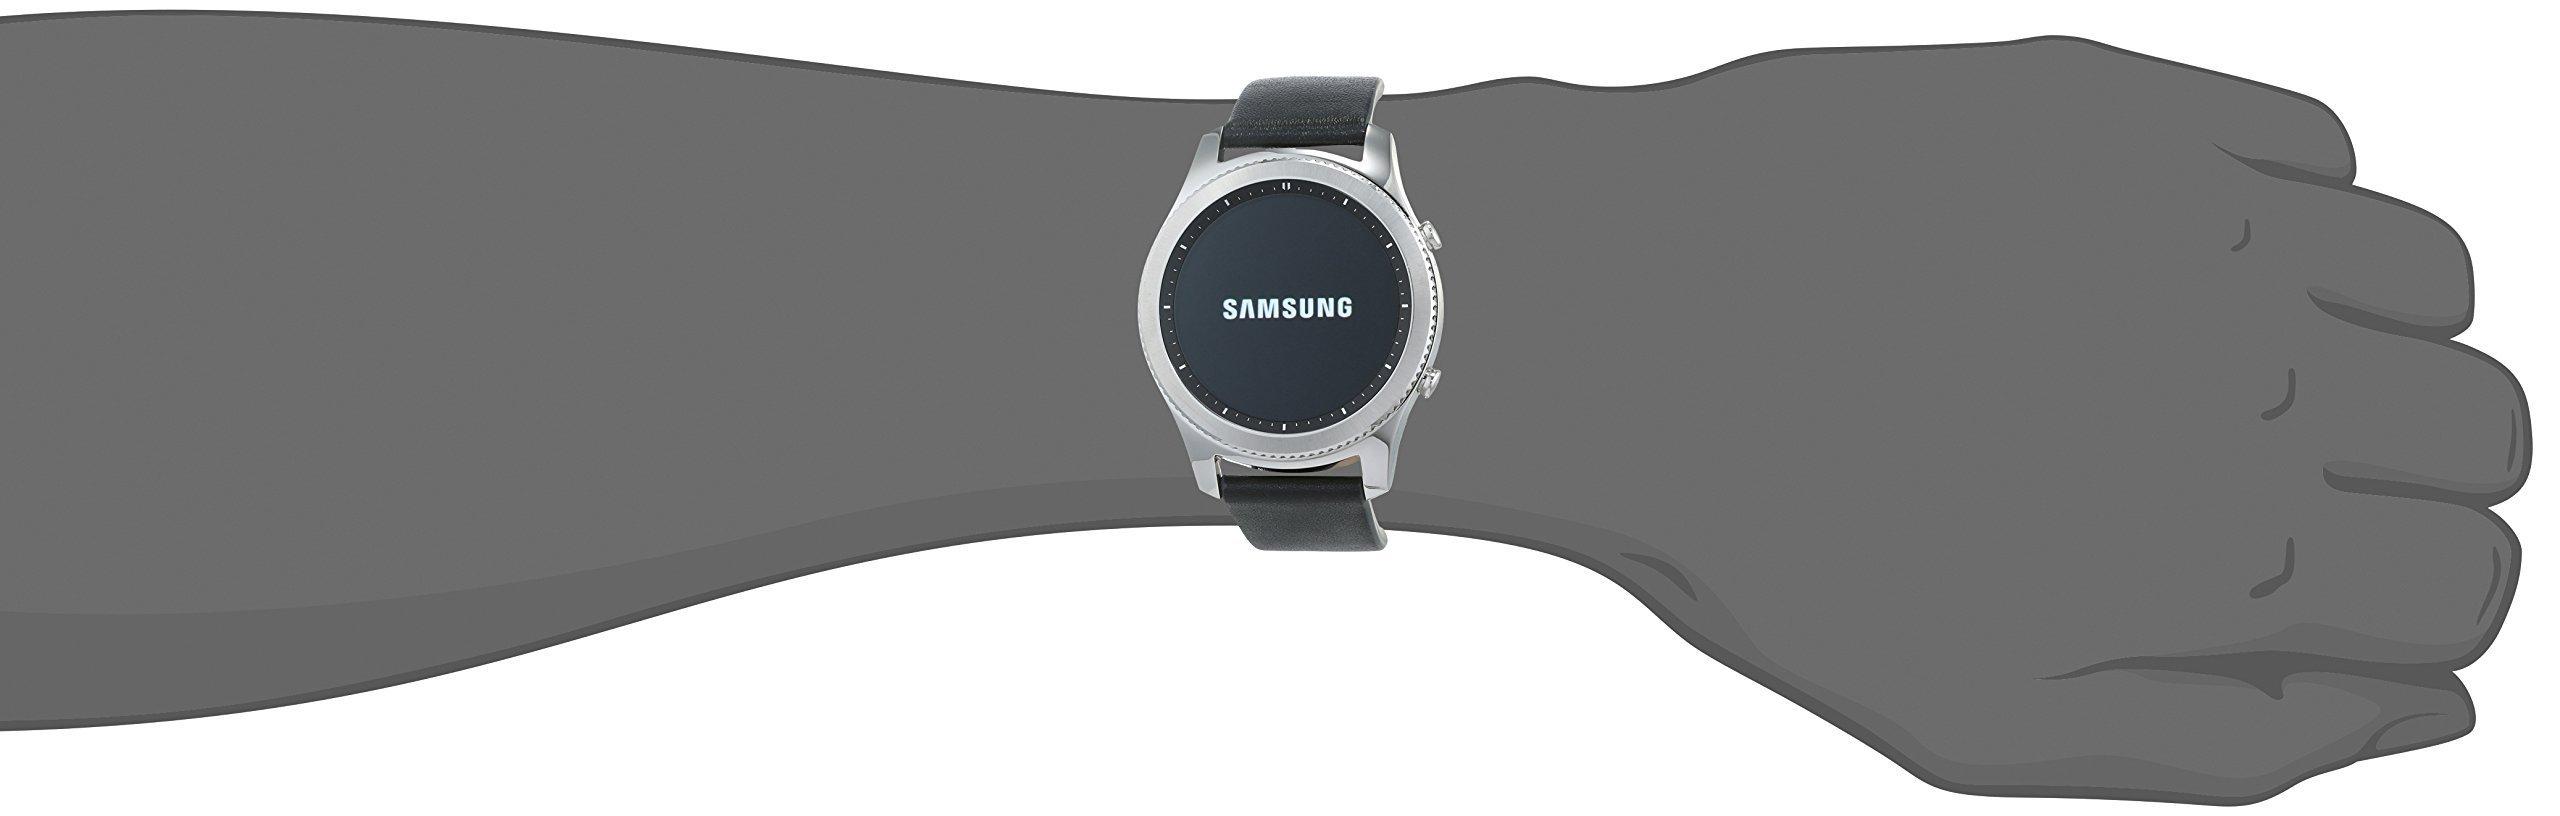 Samsung-Gear-S3-Zertifiziert-und-Generalberholt